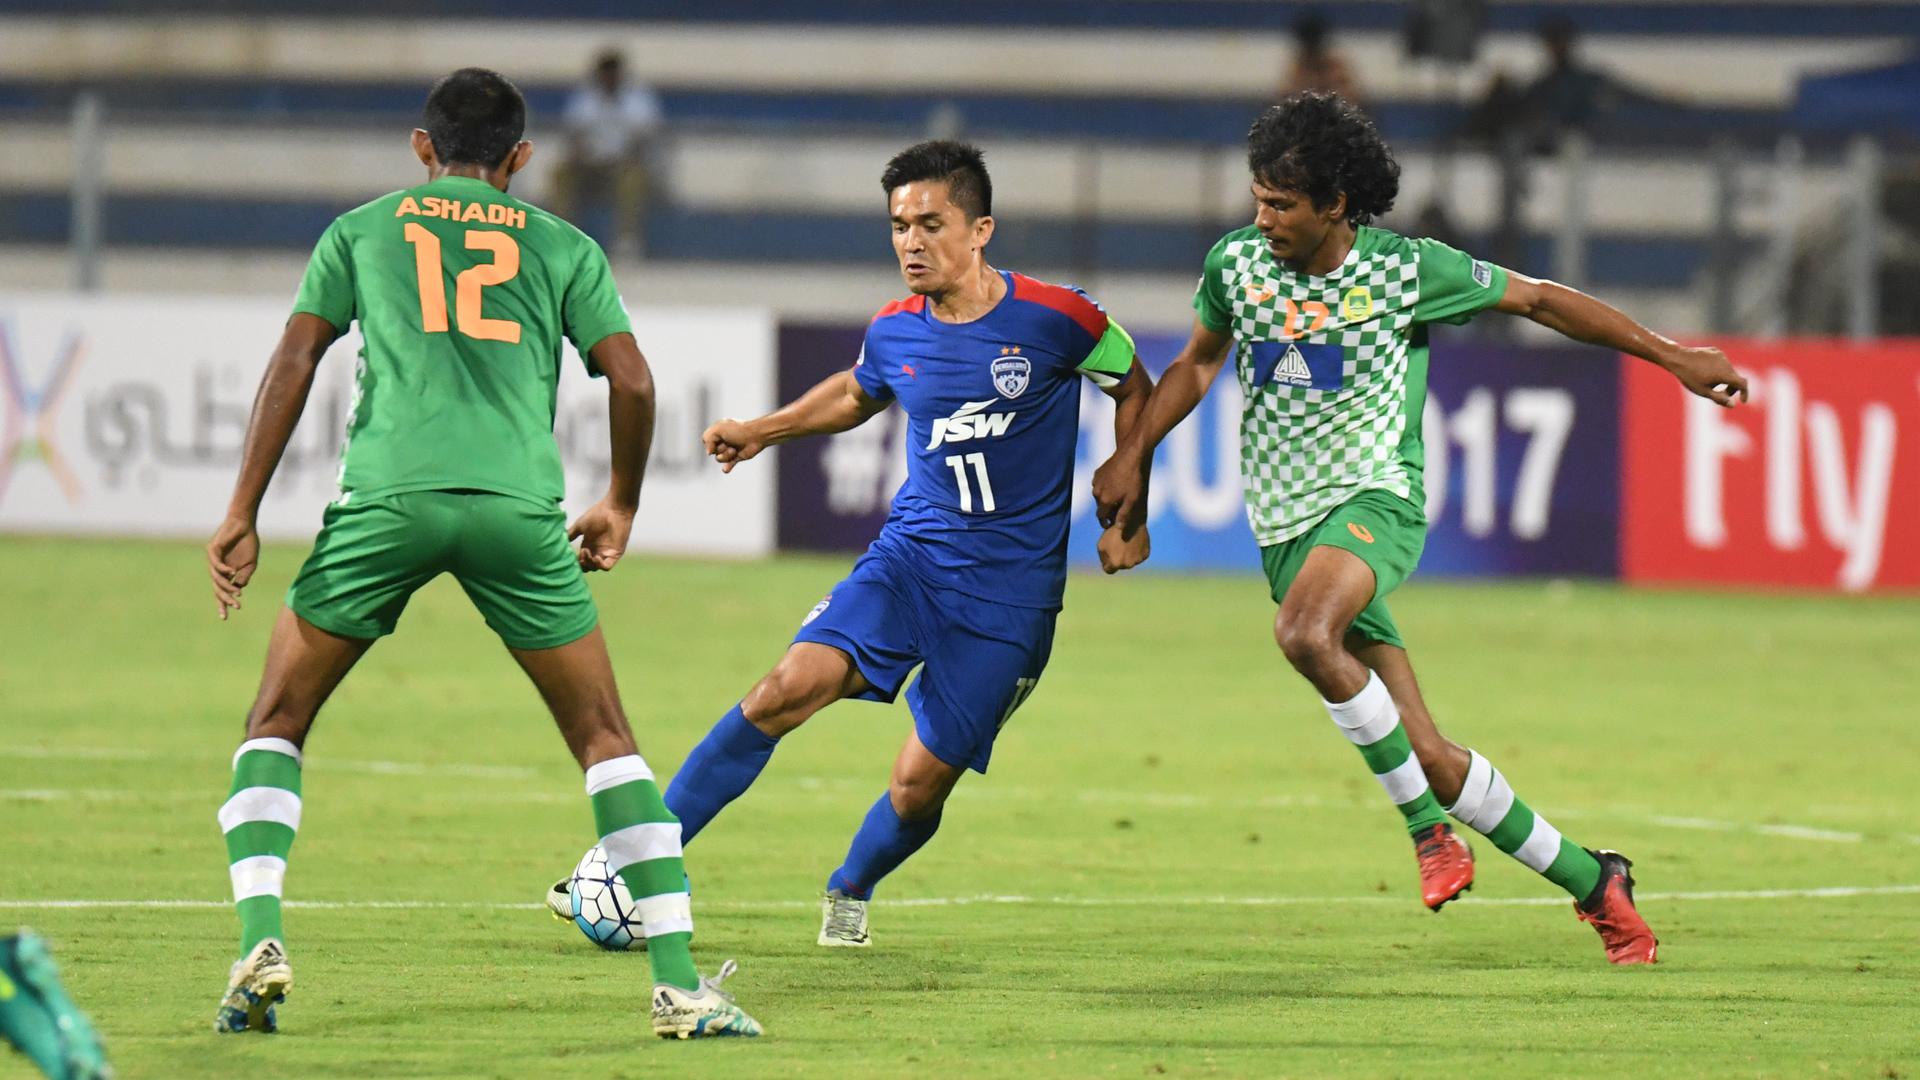 Sunil Chhetri Bengaluru FC Maziya AFC Cup Group Stage 2017